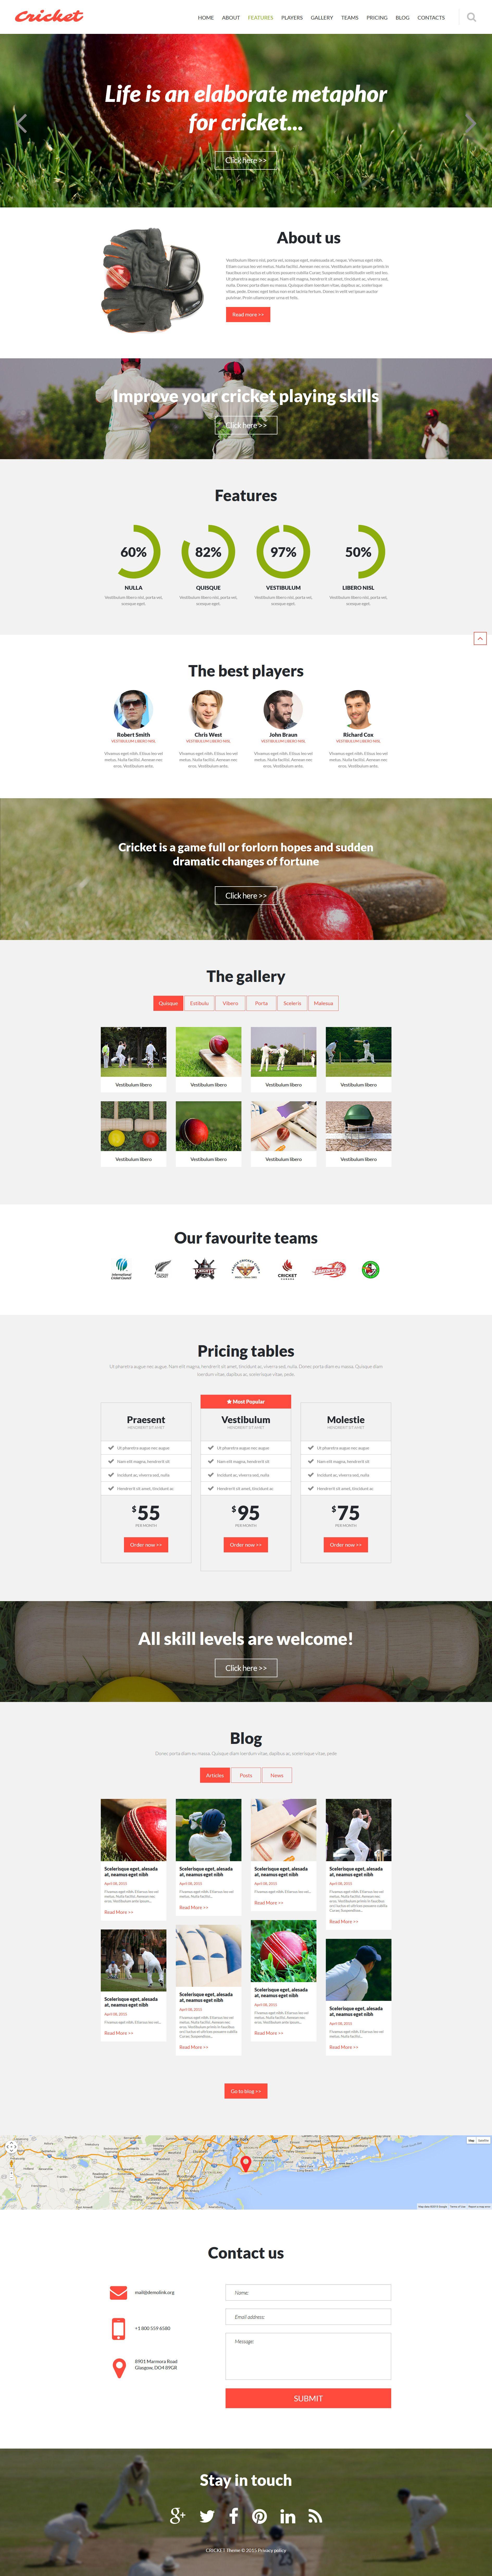 Cricket Club Joomla Template | Website Template Modern | Joomla